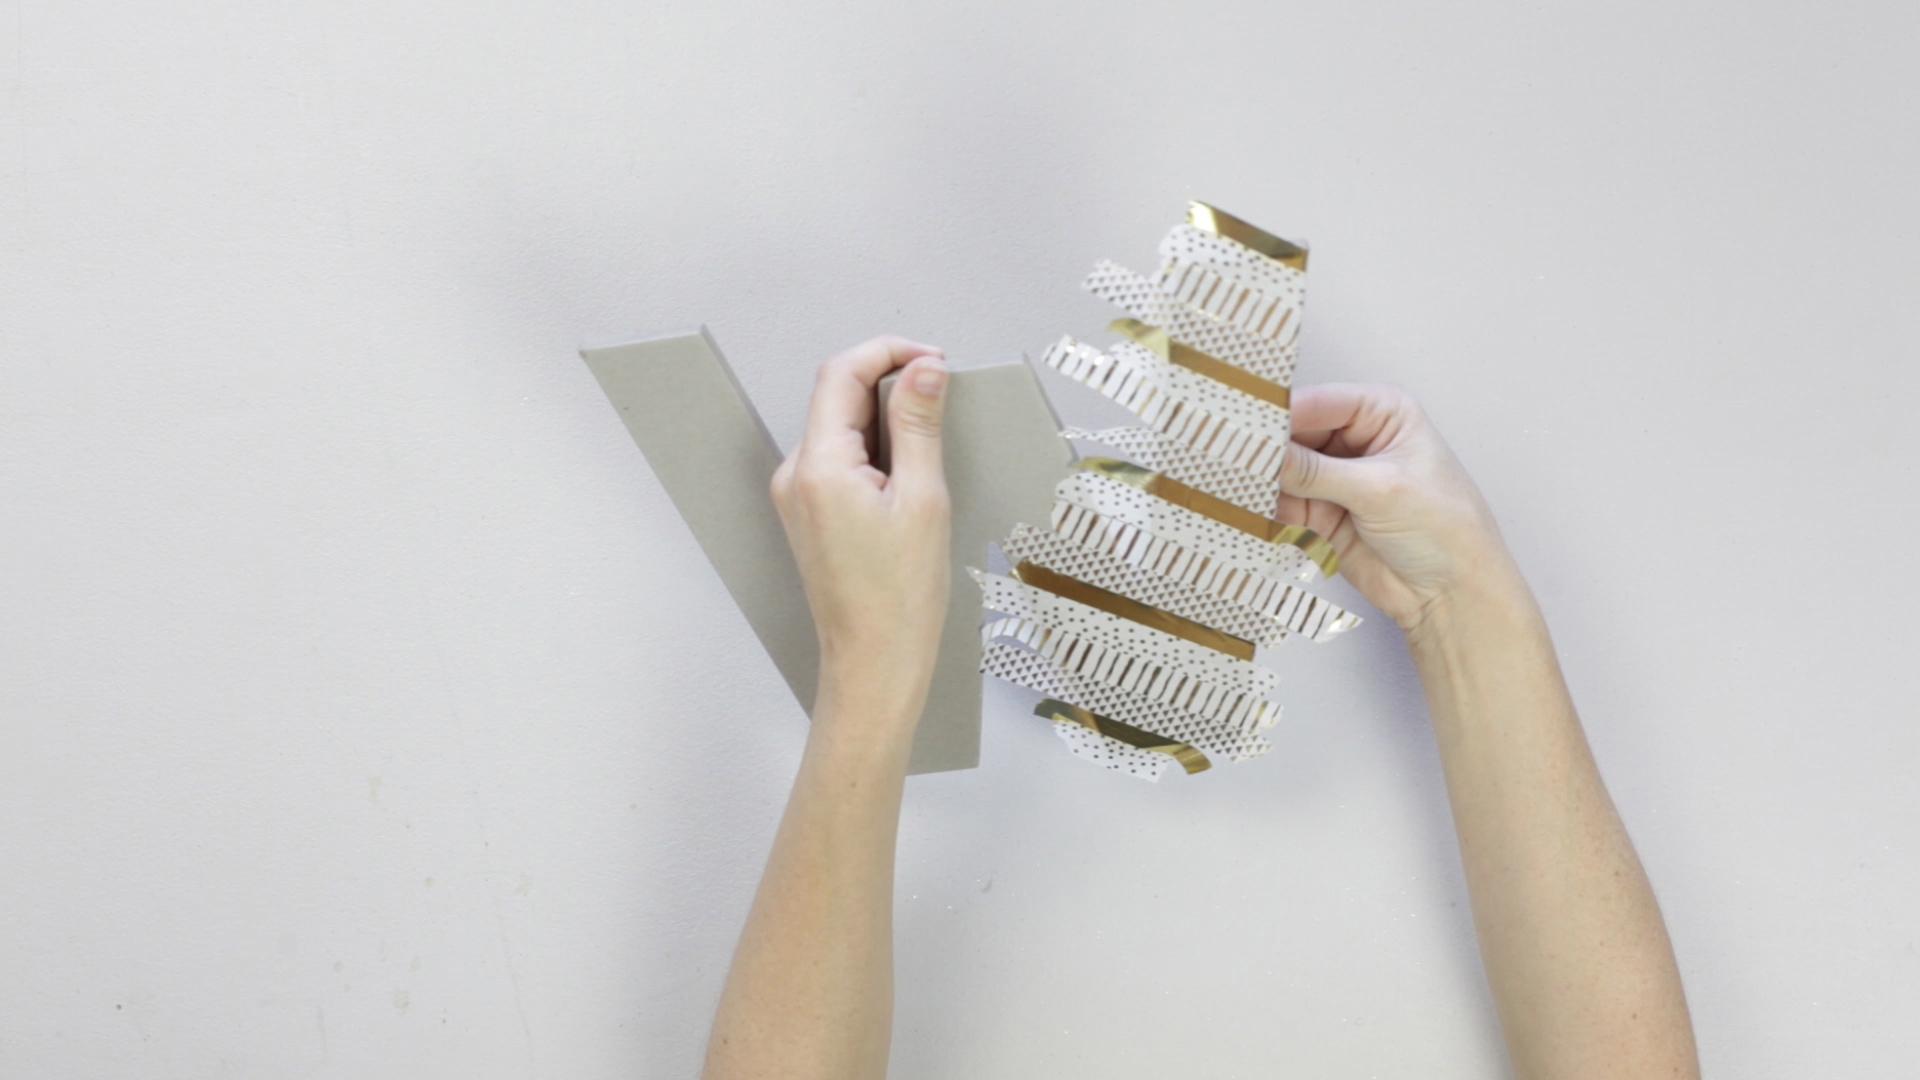 diy-washi-tape-monogram-letter-4